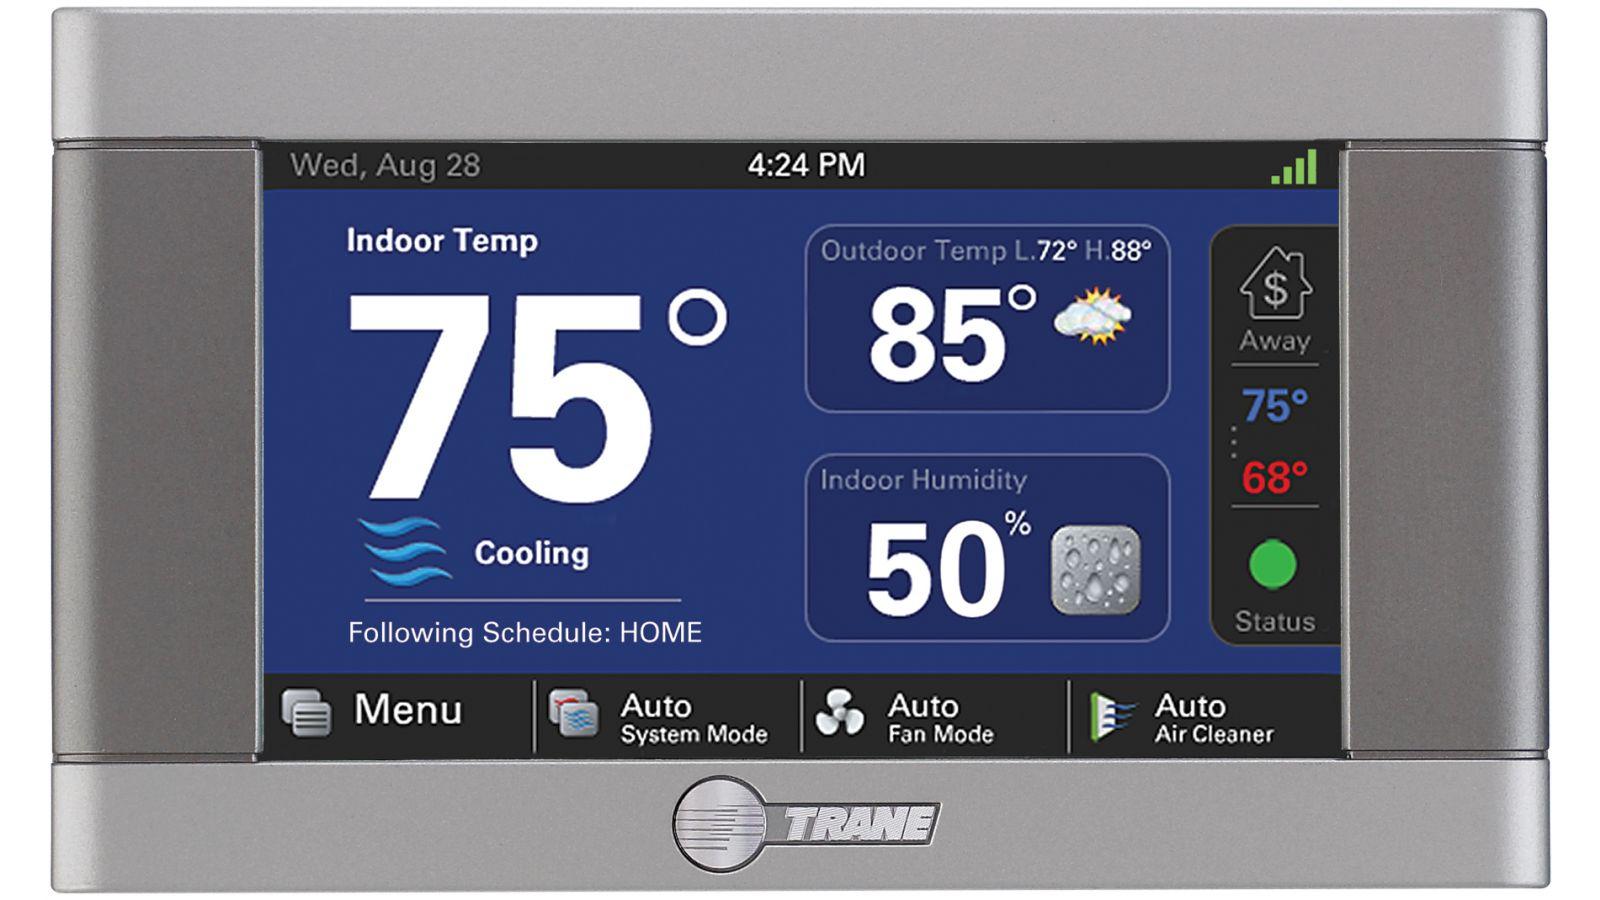 Trane XL824 Smart Control